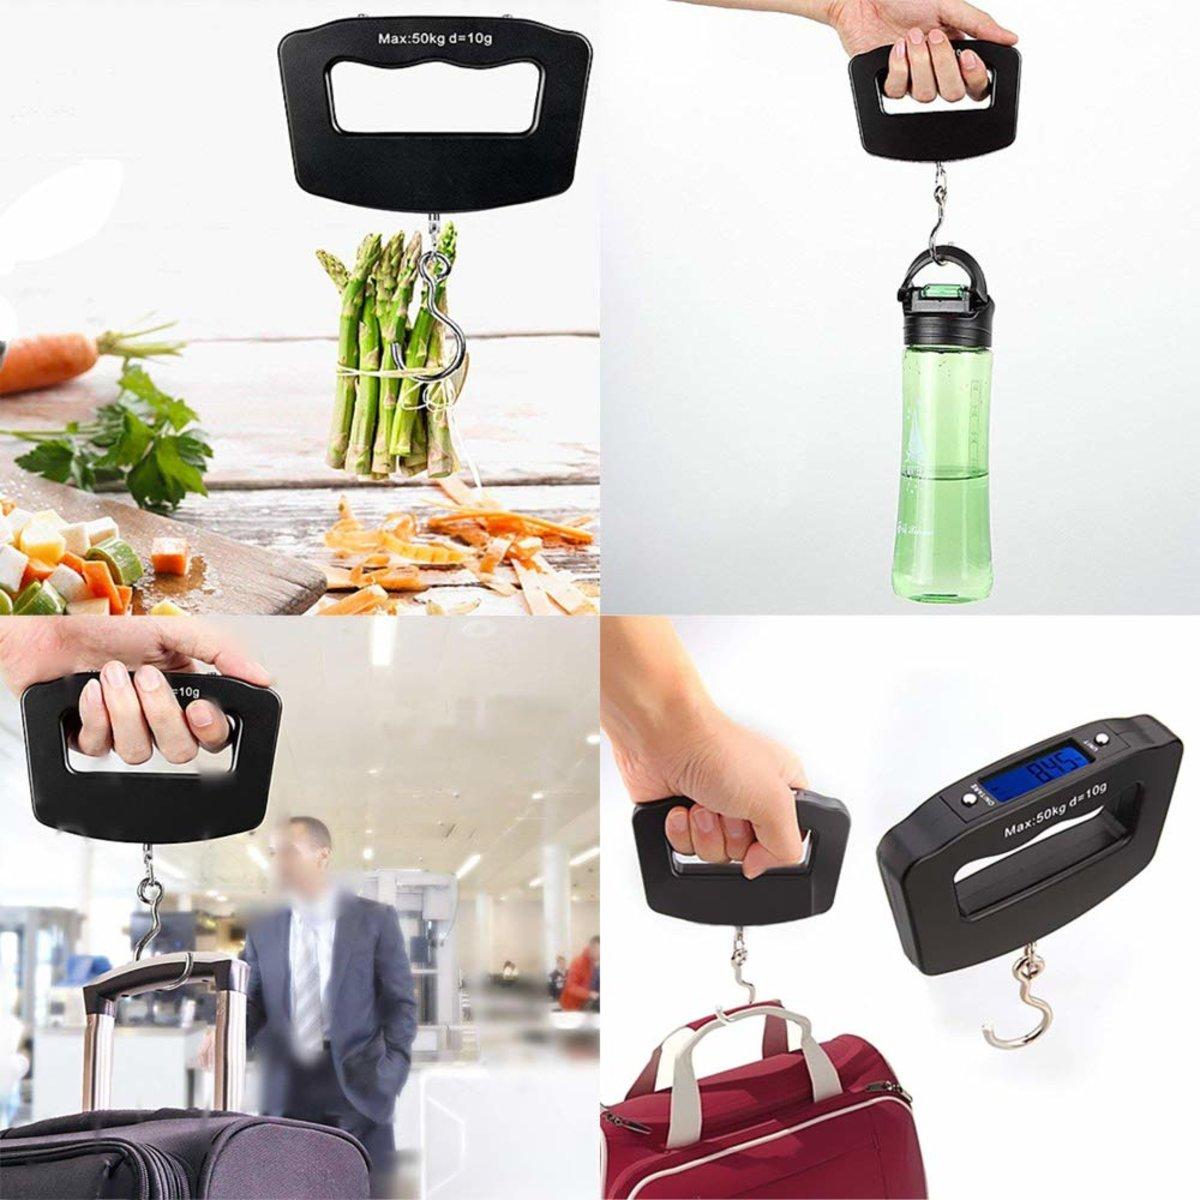 Portable Handheld Travel Luggage Electronic Scale,